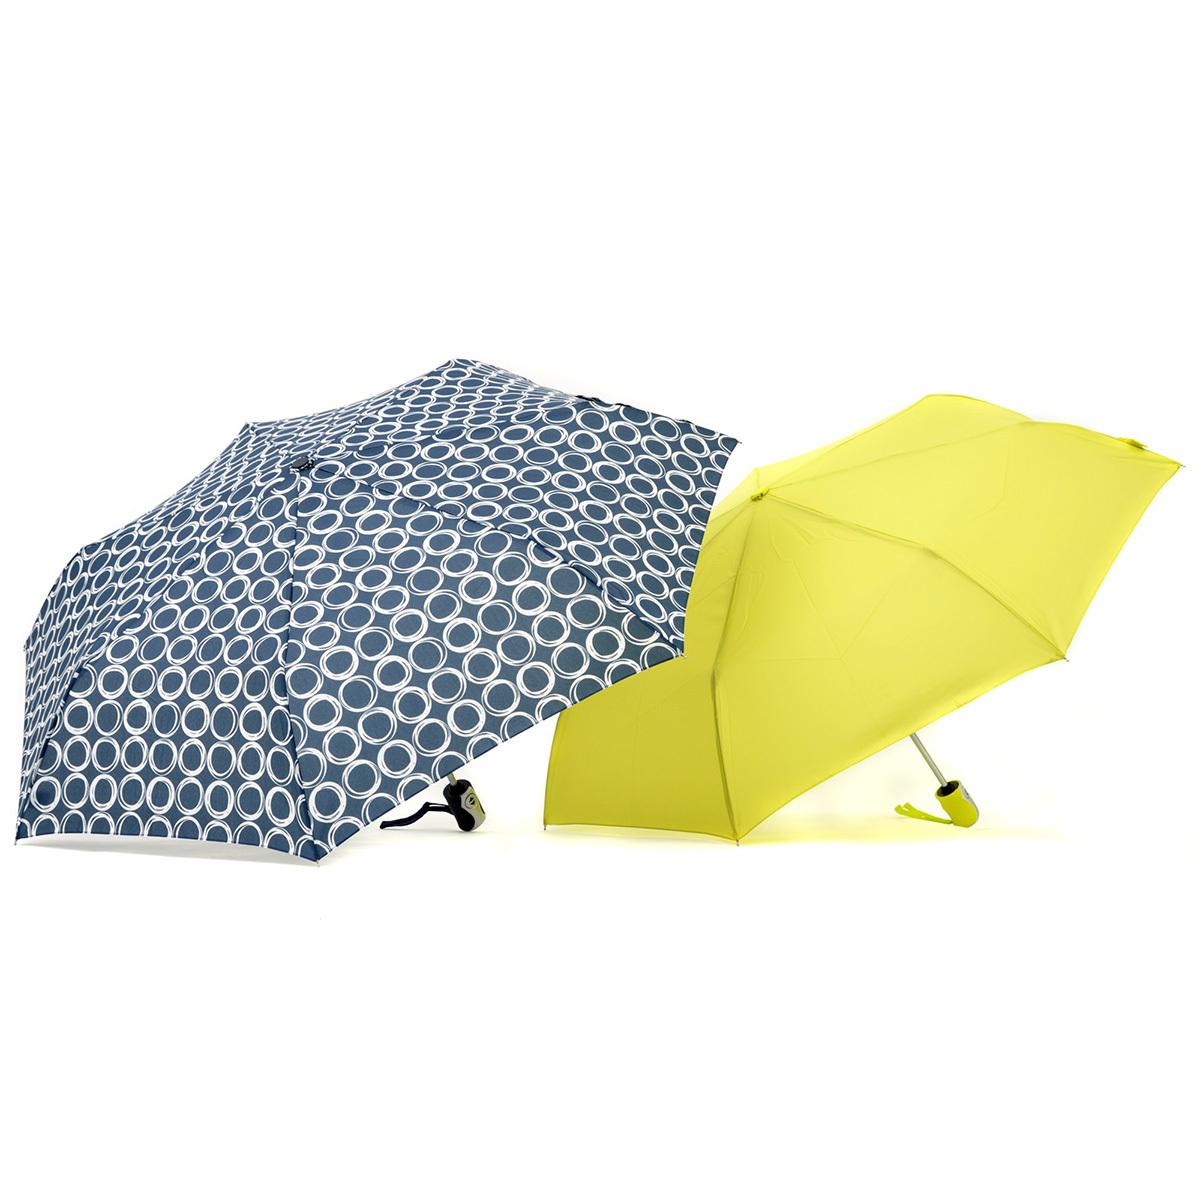 Costco en Linea: 2 paraguas Ezpeleta